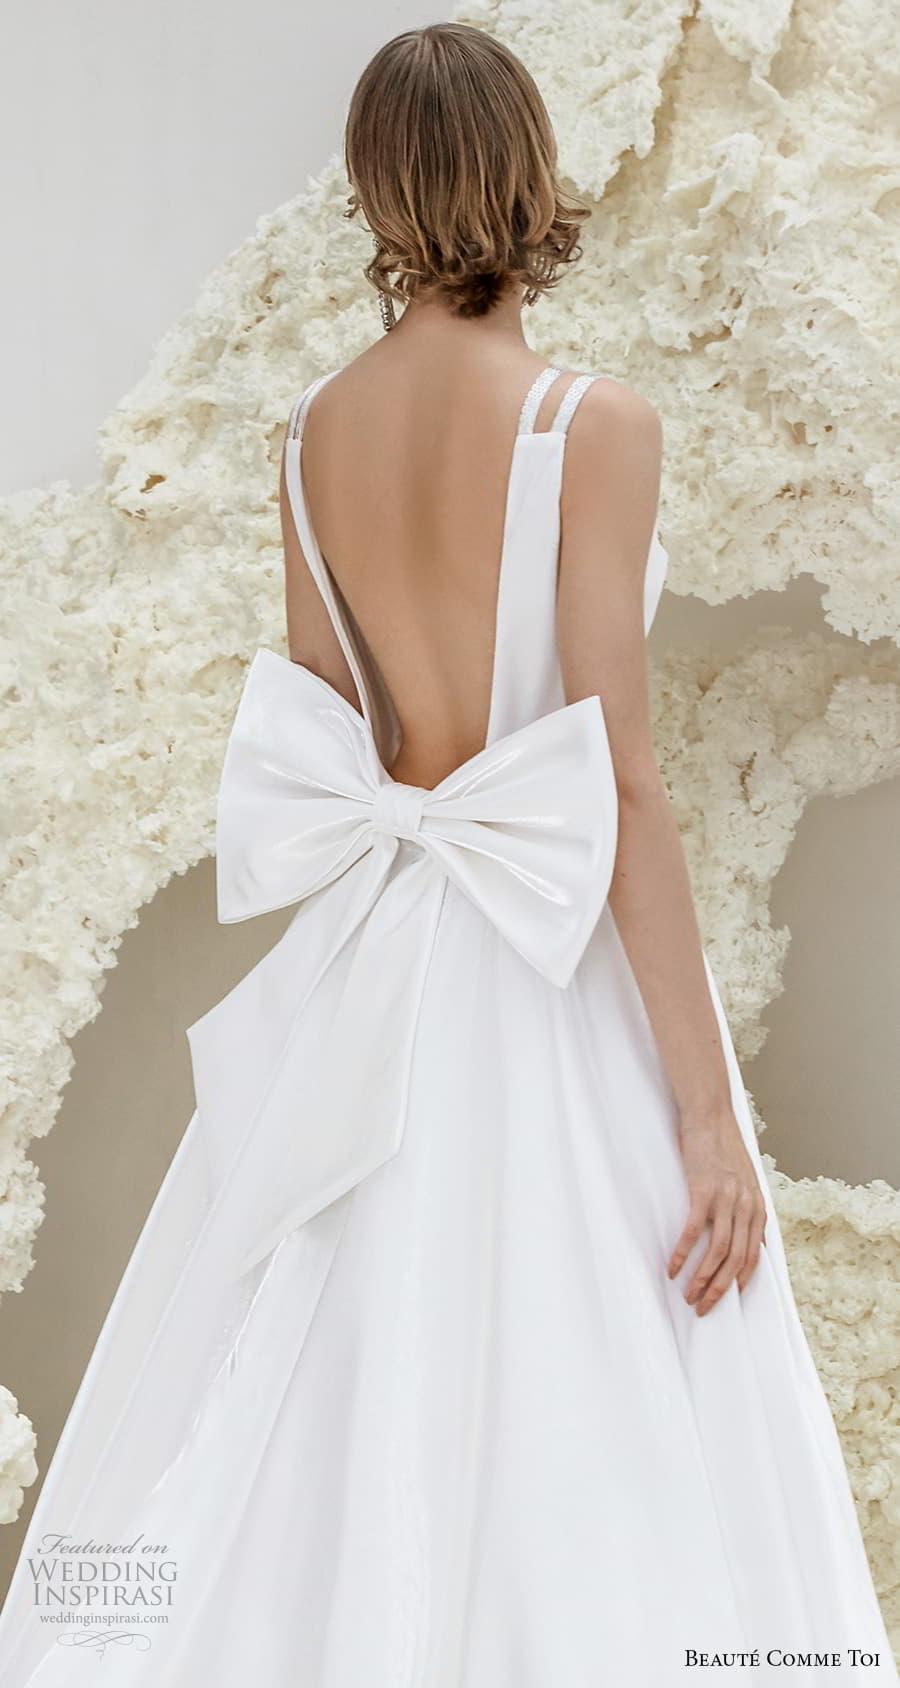 beaute comme toi spring 2022 bridal double strap deep v neckline simple minimalist modern chic a line wedding dress low ribbon back chapel train (phyllis) zbv